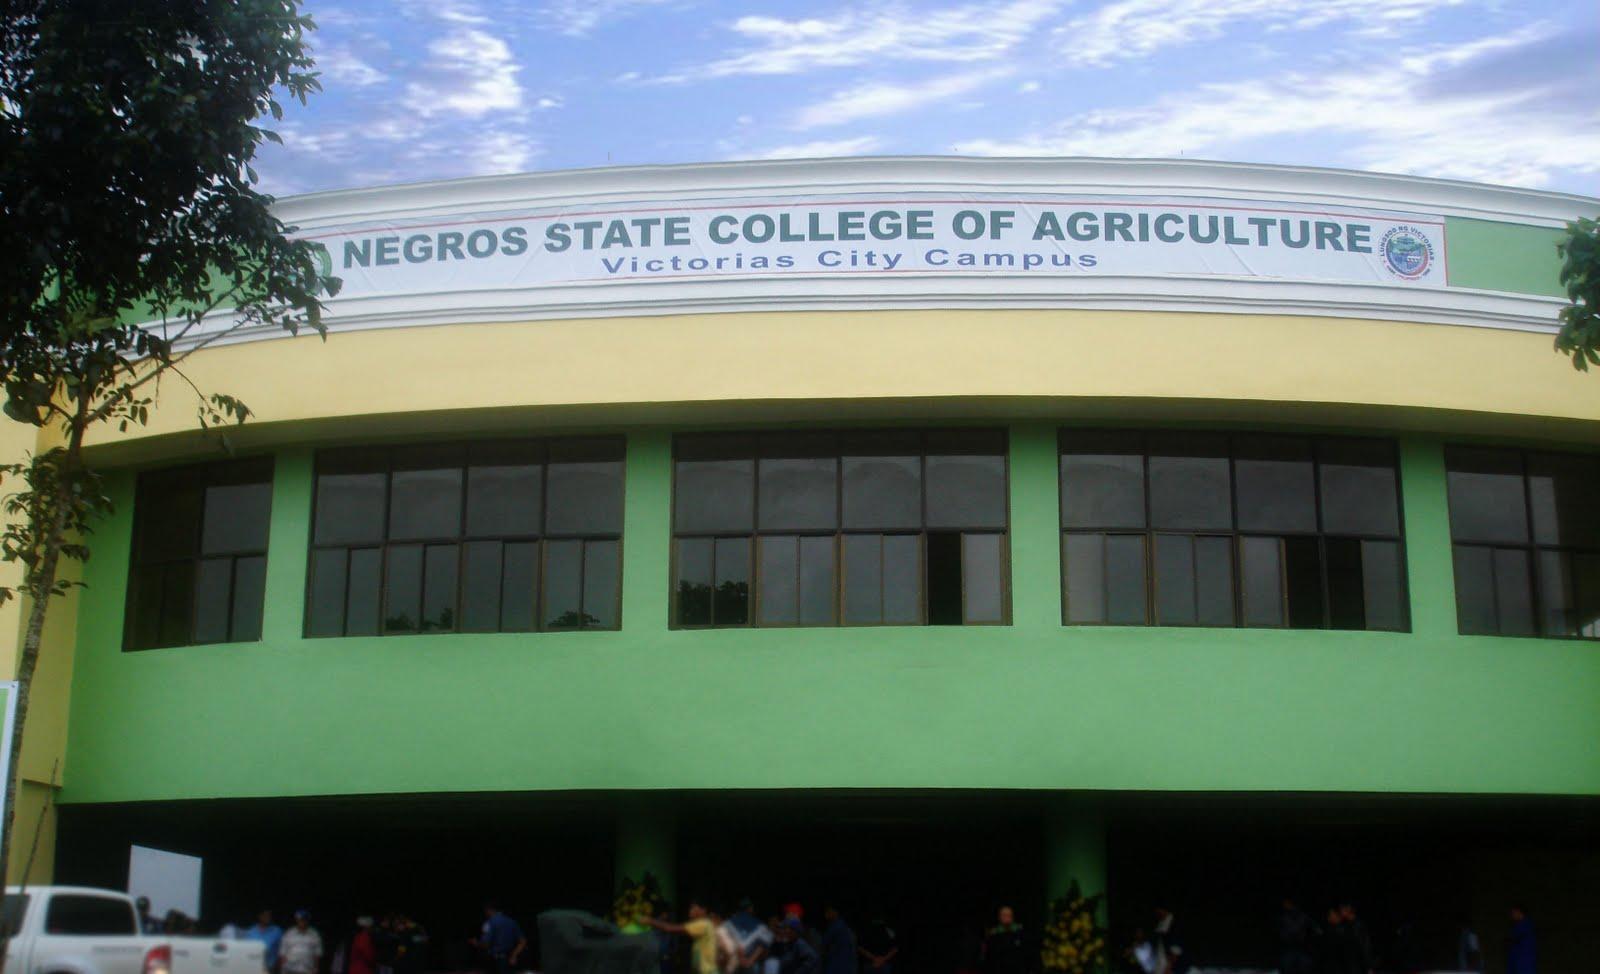 University Visayas